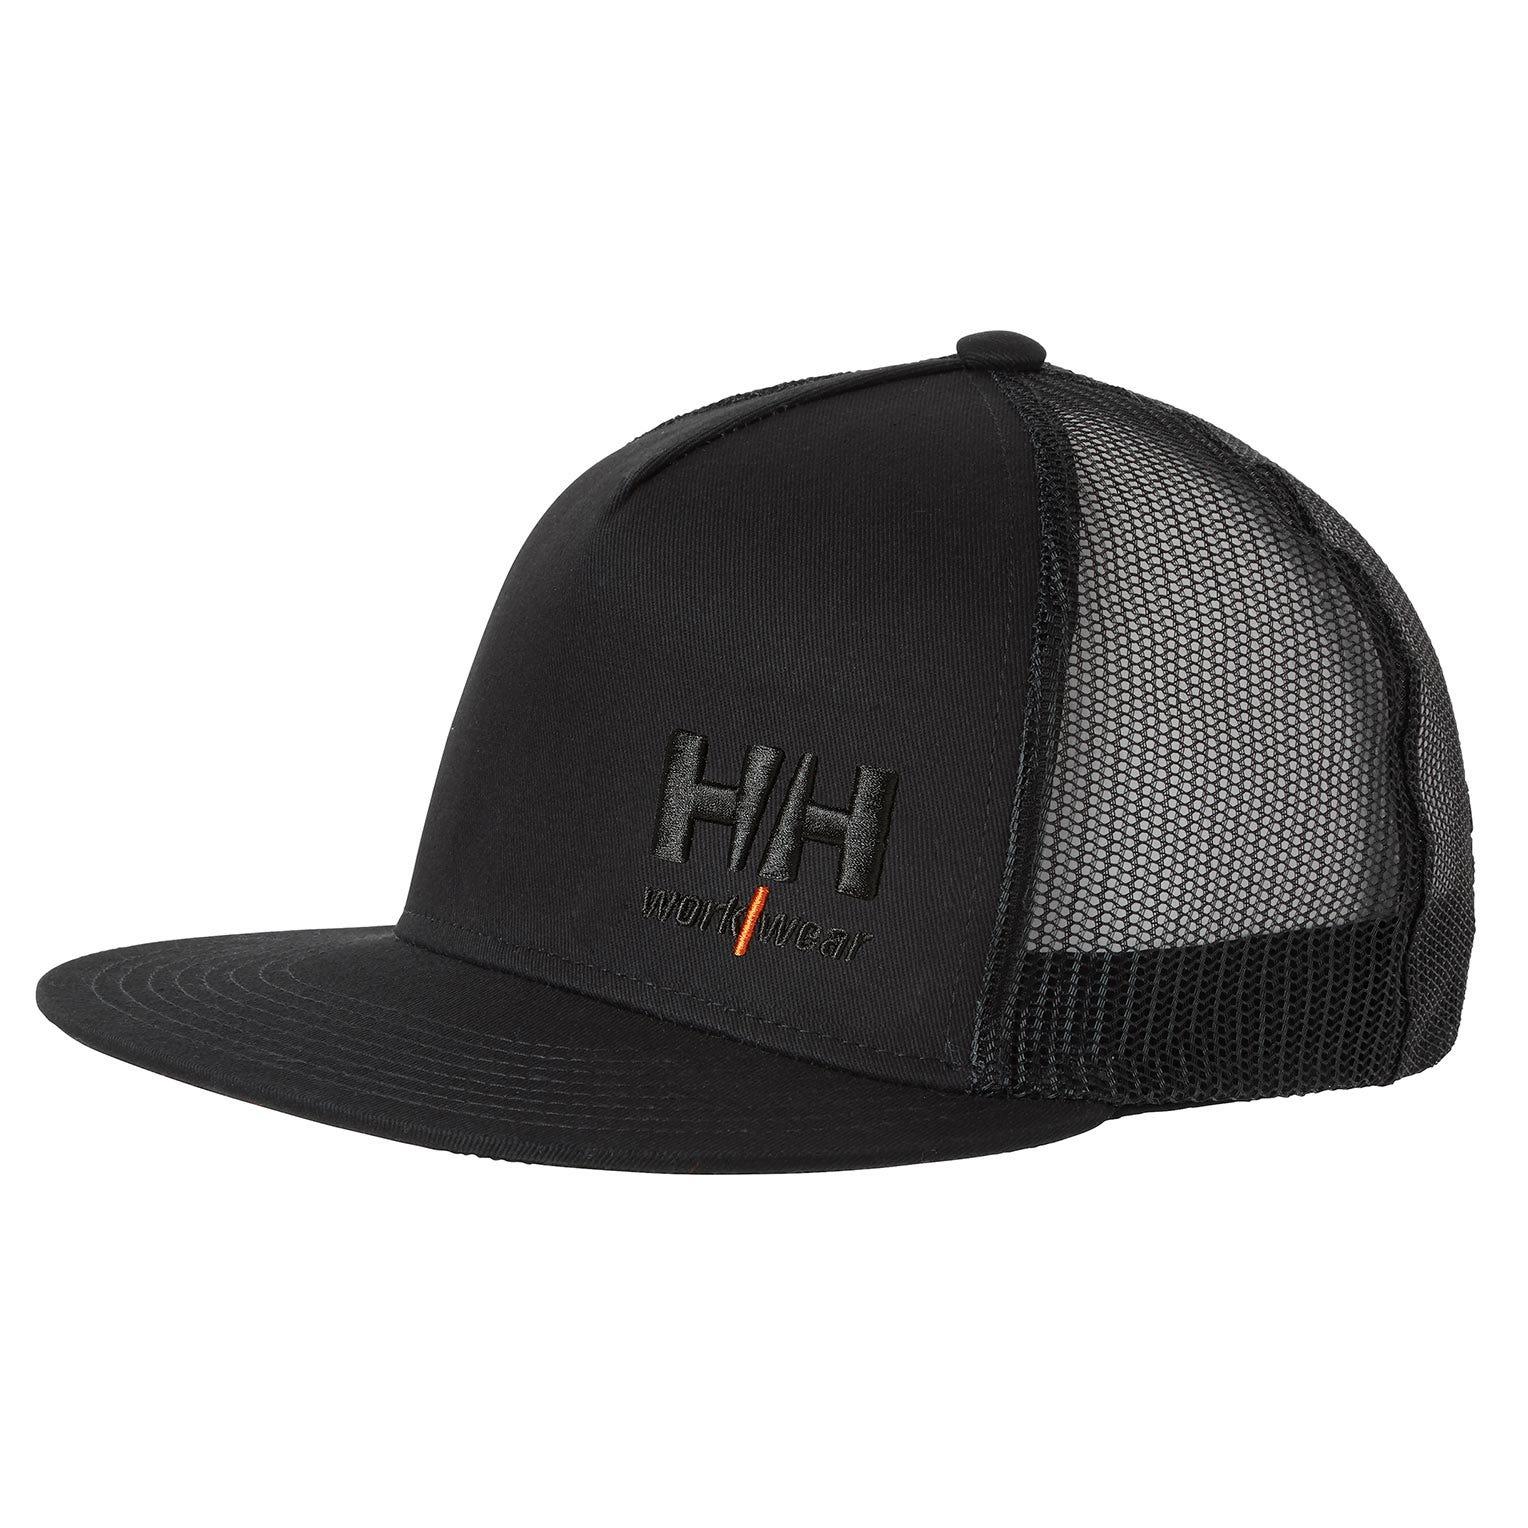 Helly Hansen Caps Kensington 79805 zwart(990)